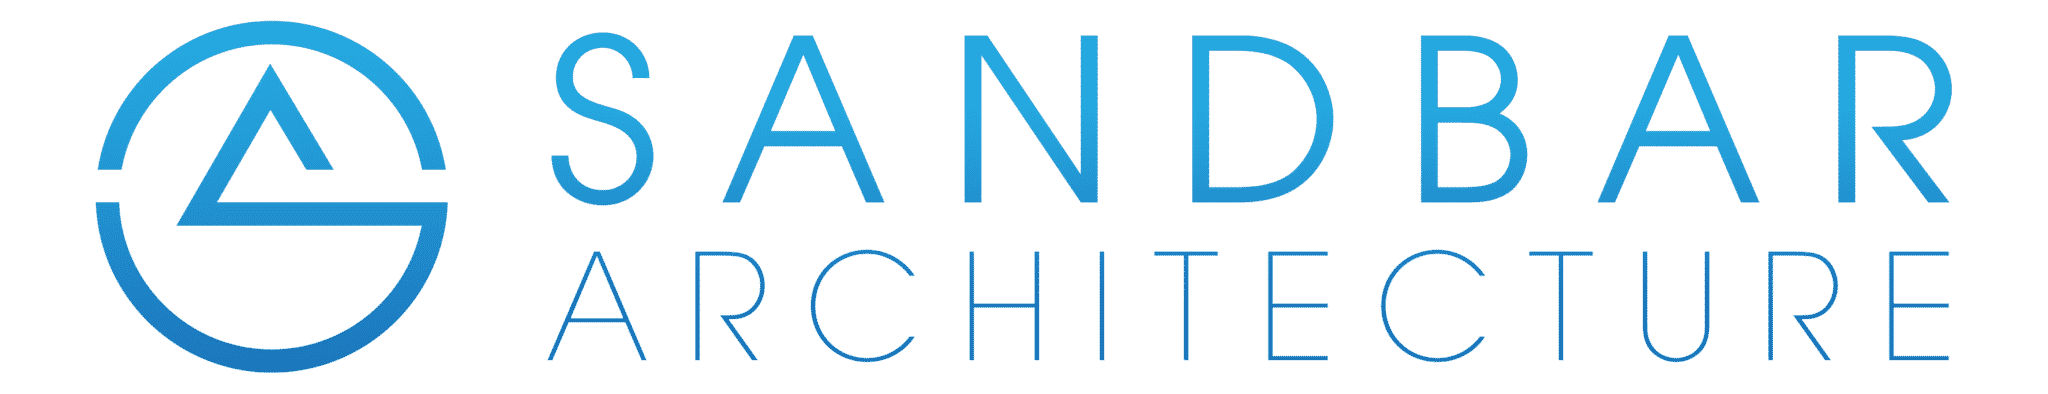 Sandbar Architecture Logo